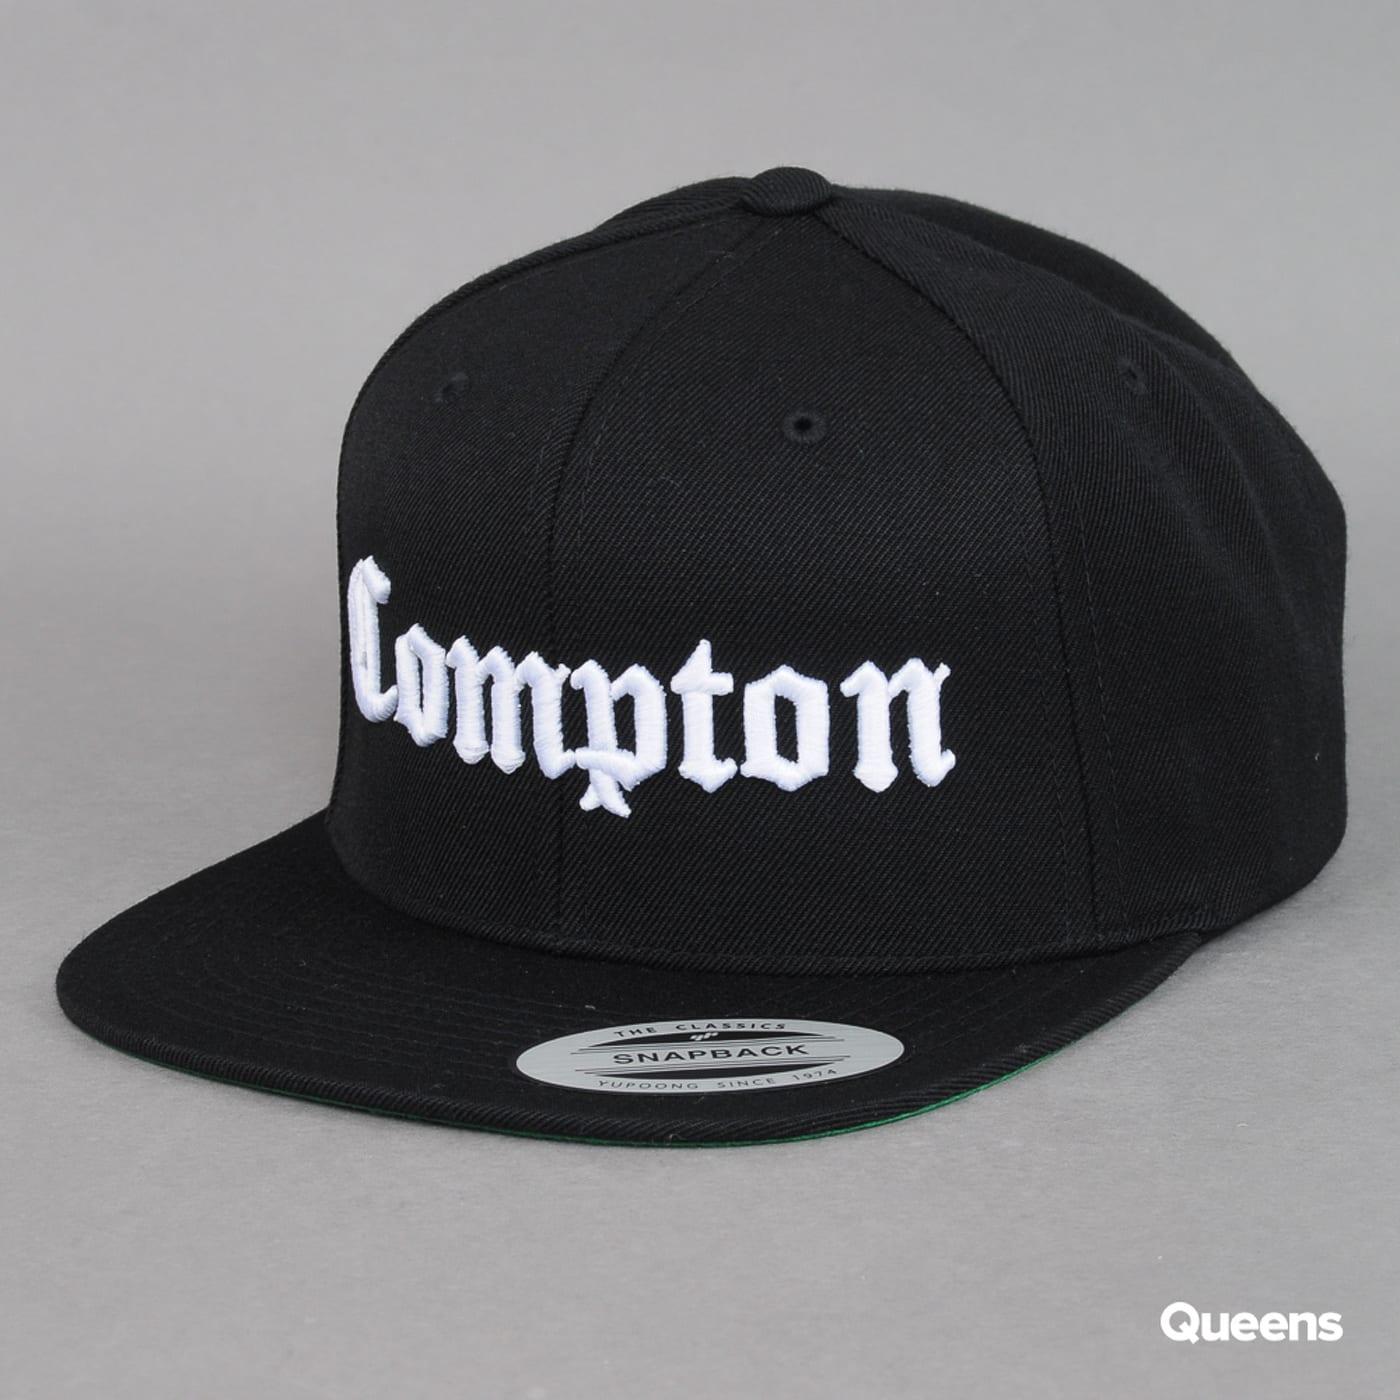 Yupoong Compton Cap black / white